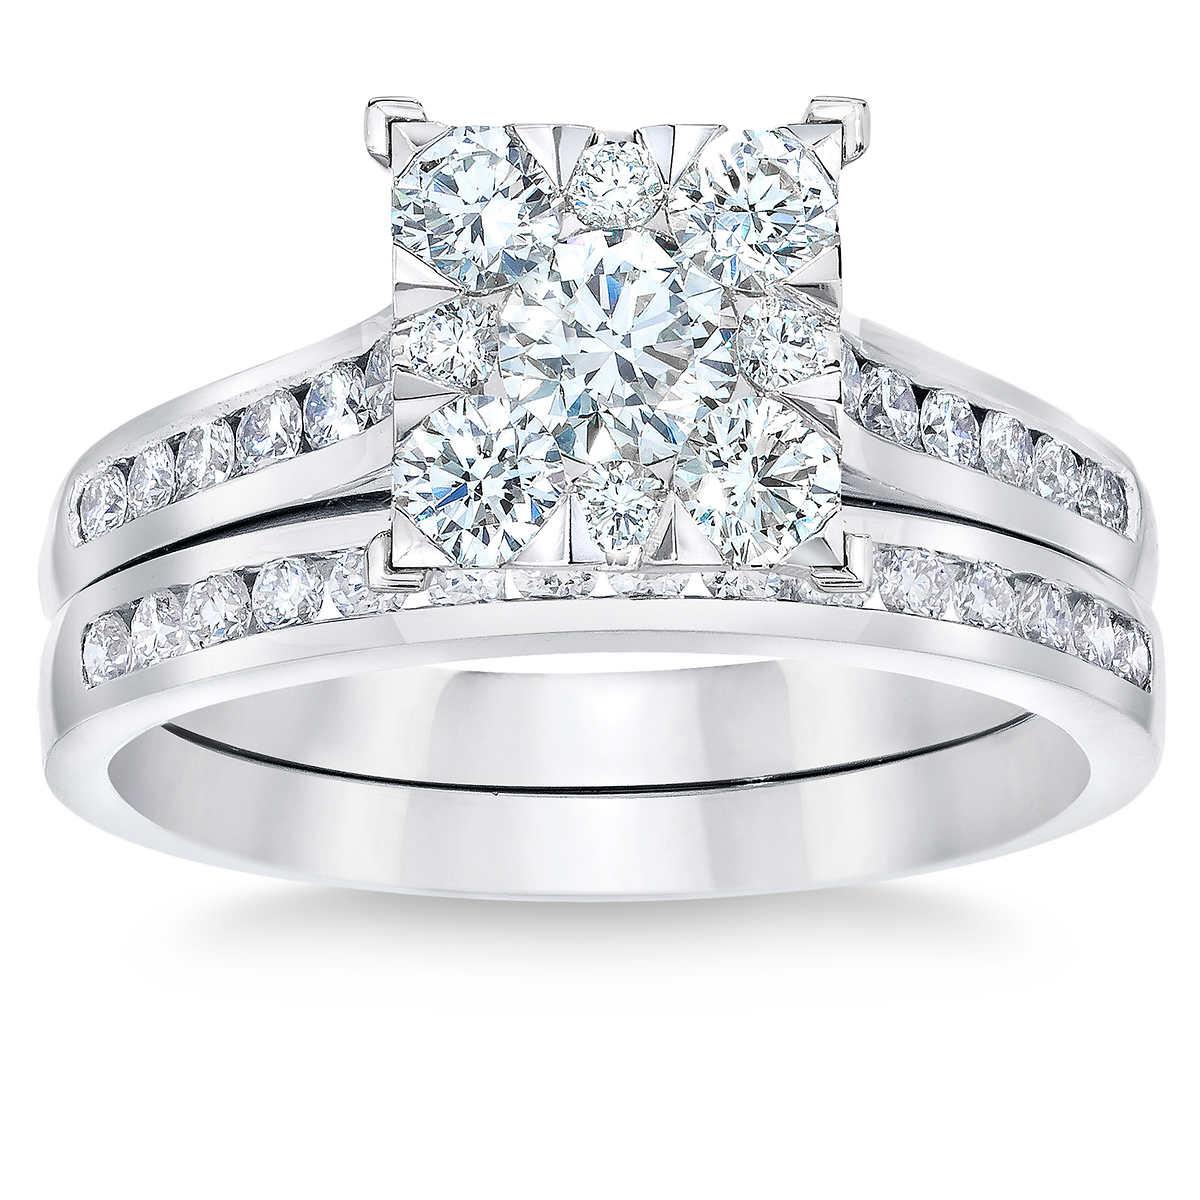 round brilliant 110 ctw vs2 clarity i color diamond 14kt white gold wedding set - Costco Wedding Rings